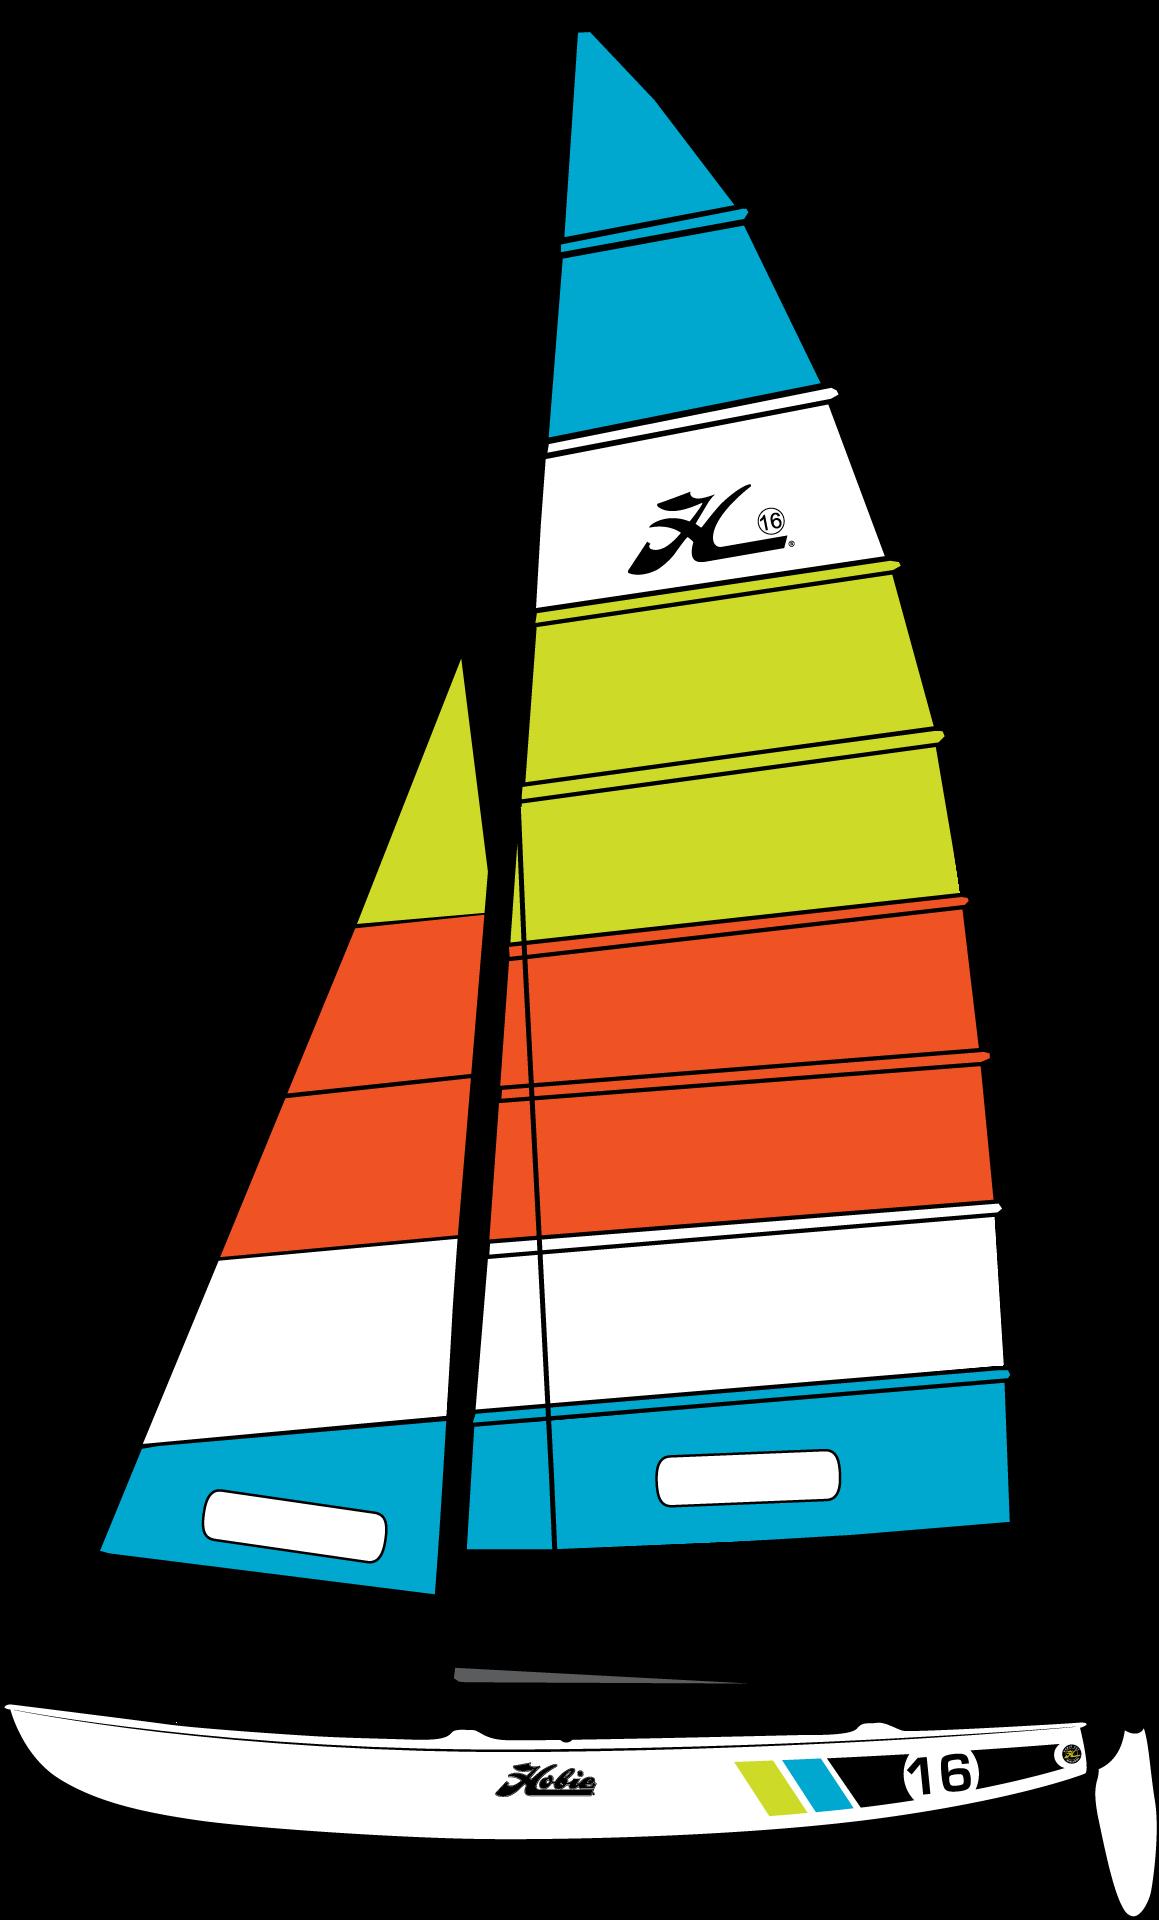 clip art freeuse download Hobie catamaran fiberglass sailboats. Yacht clipart racing boat